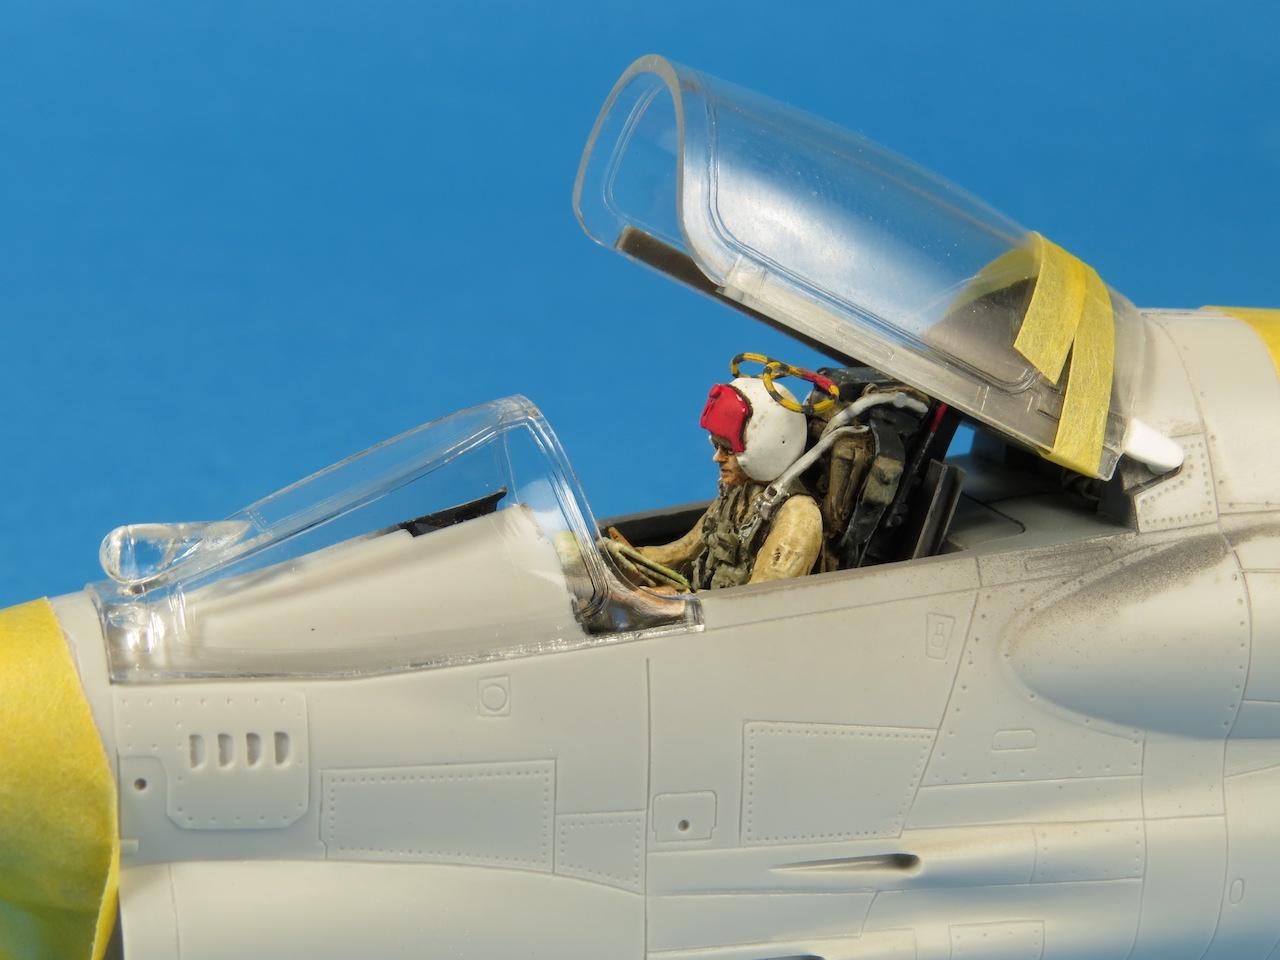 Furball Decals 1//48 VOUGHT F-8 CRUSADER Canopy /& Wheel Hub Vinyl Mask Set